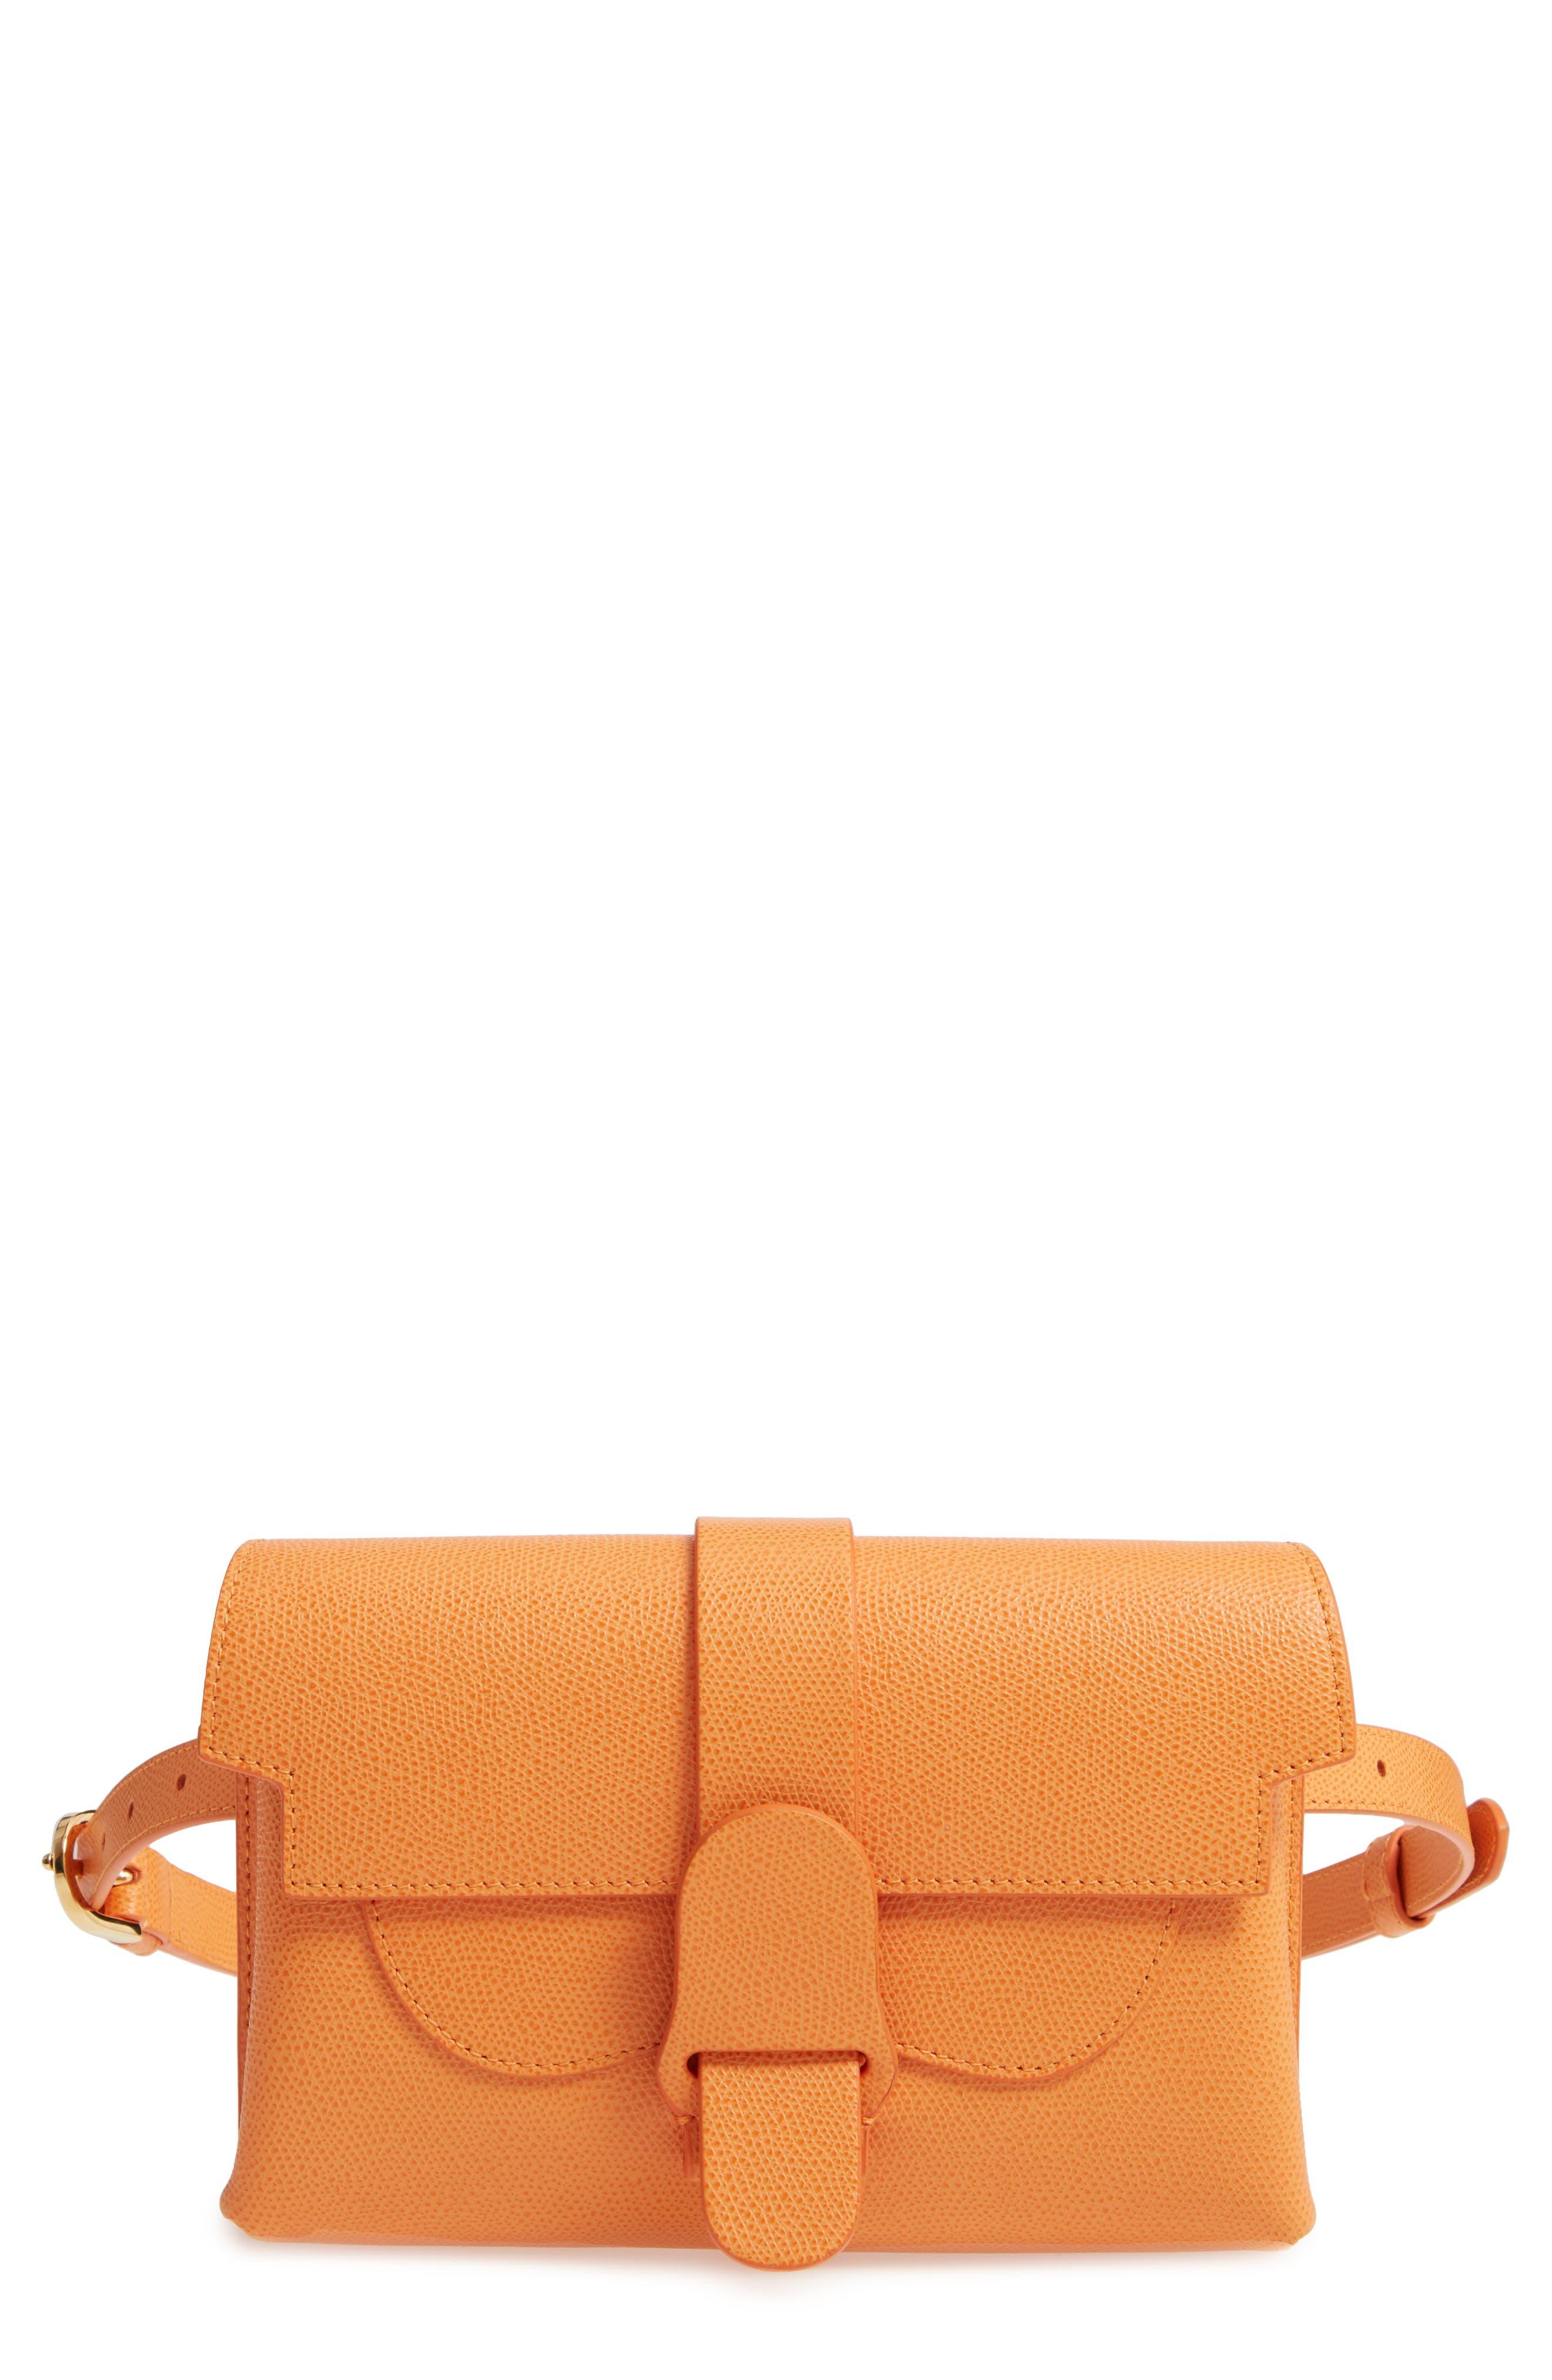 7b8dfd0f4eed SENREVE Handbags & Wallets for Women | Nordstrom